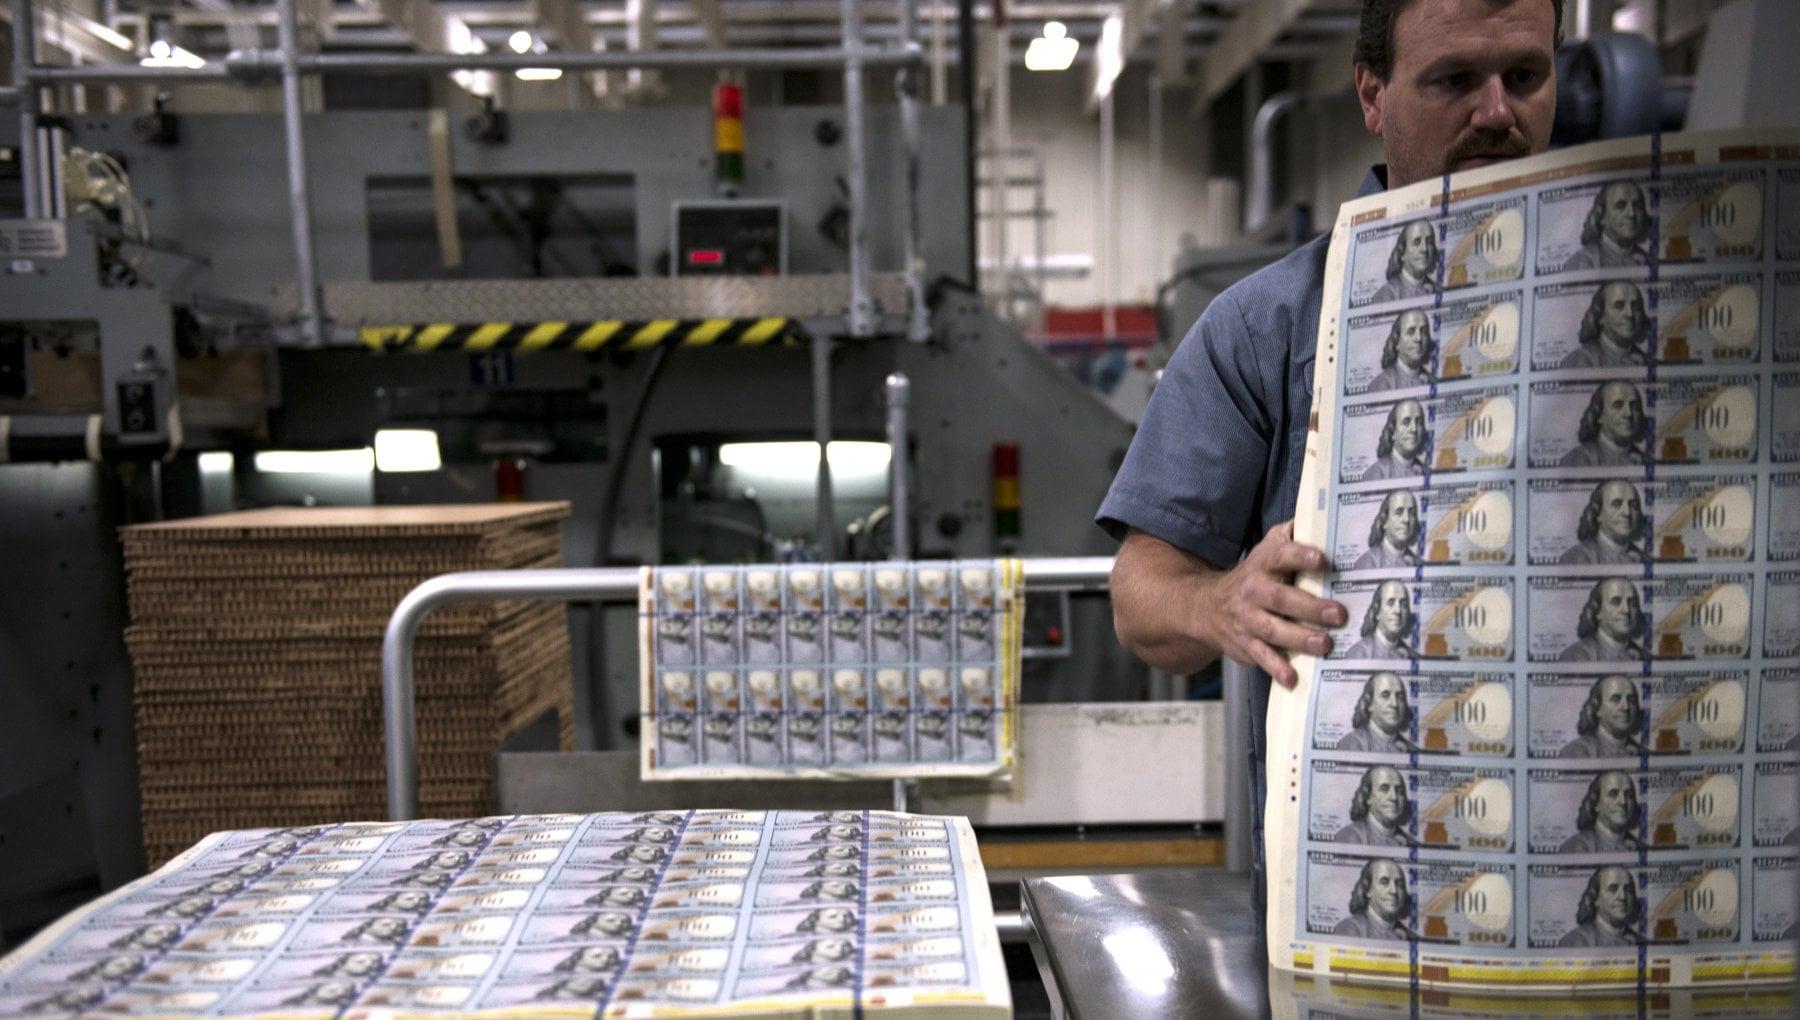 Stephanie Kelton quando i soldi finiscono si stampano